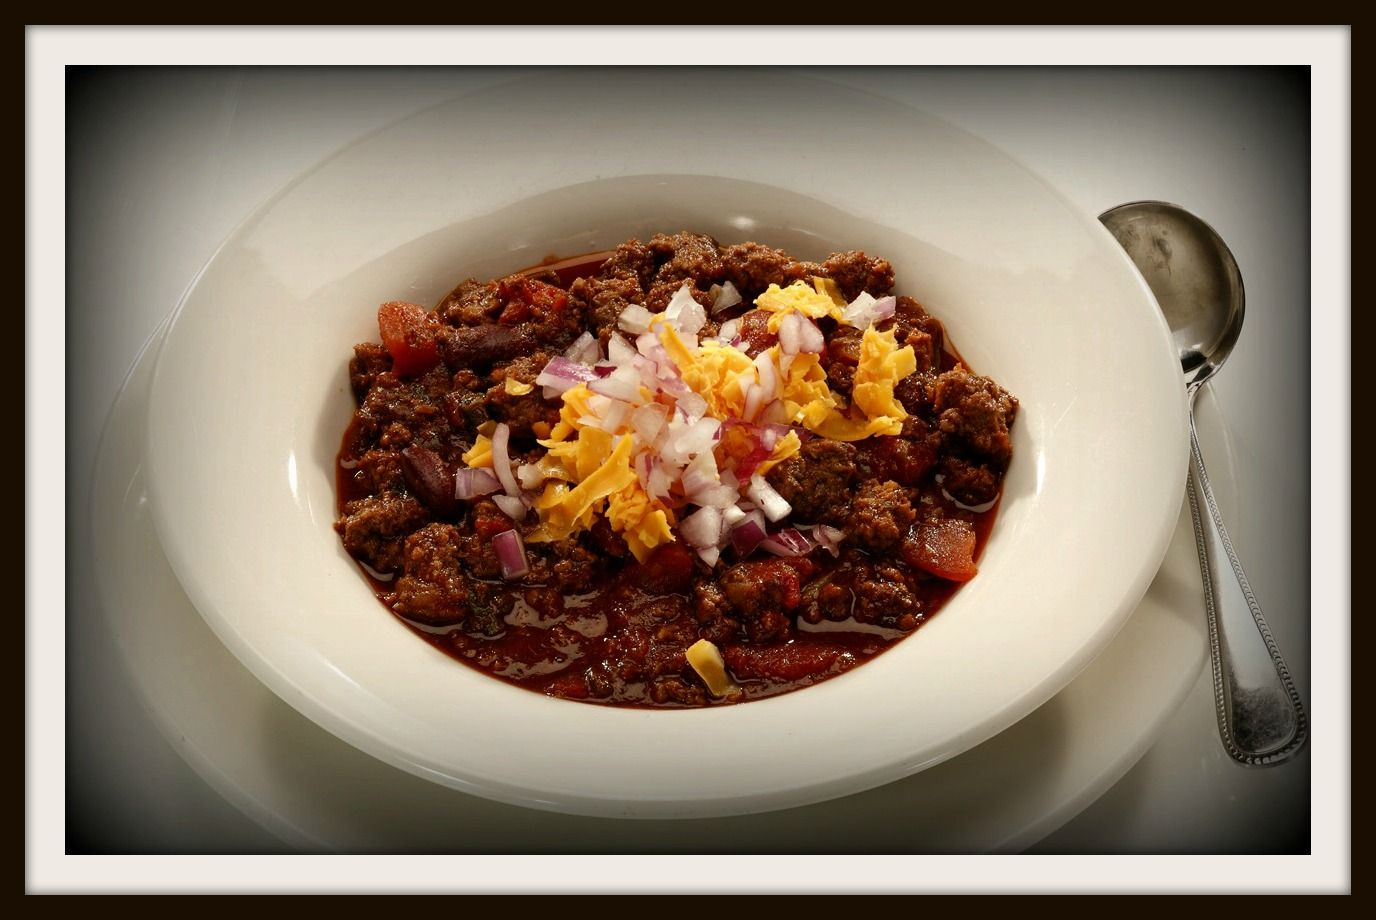 Firebirds Chili Recipe Fall Food Tailgate Best Chili Recipe Restaurant Recipes Recipes